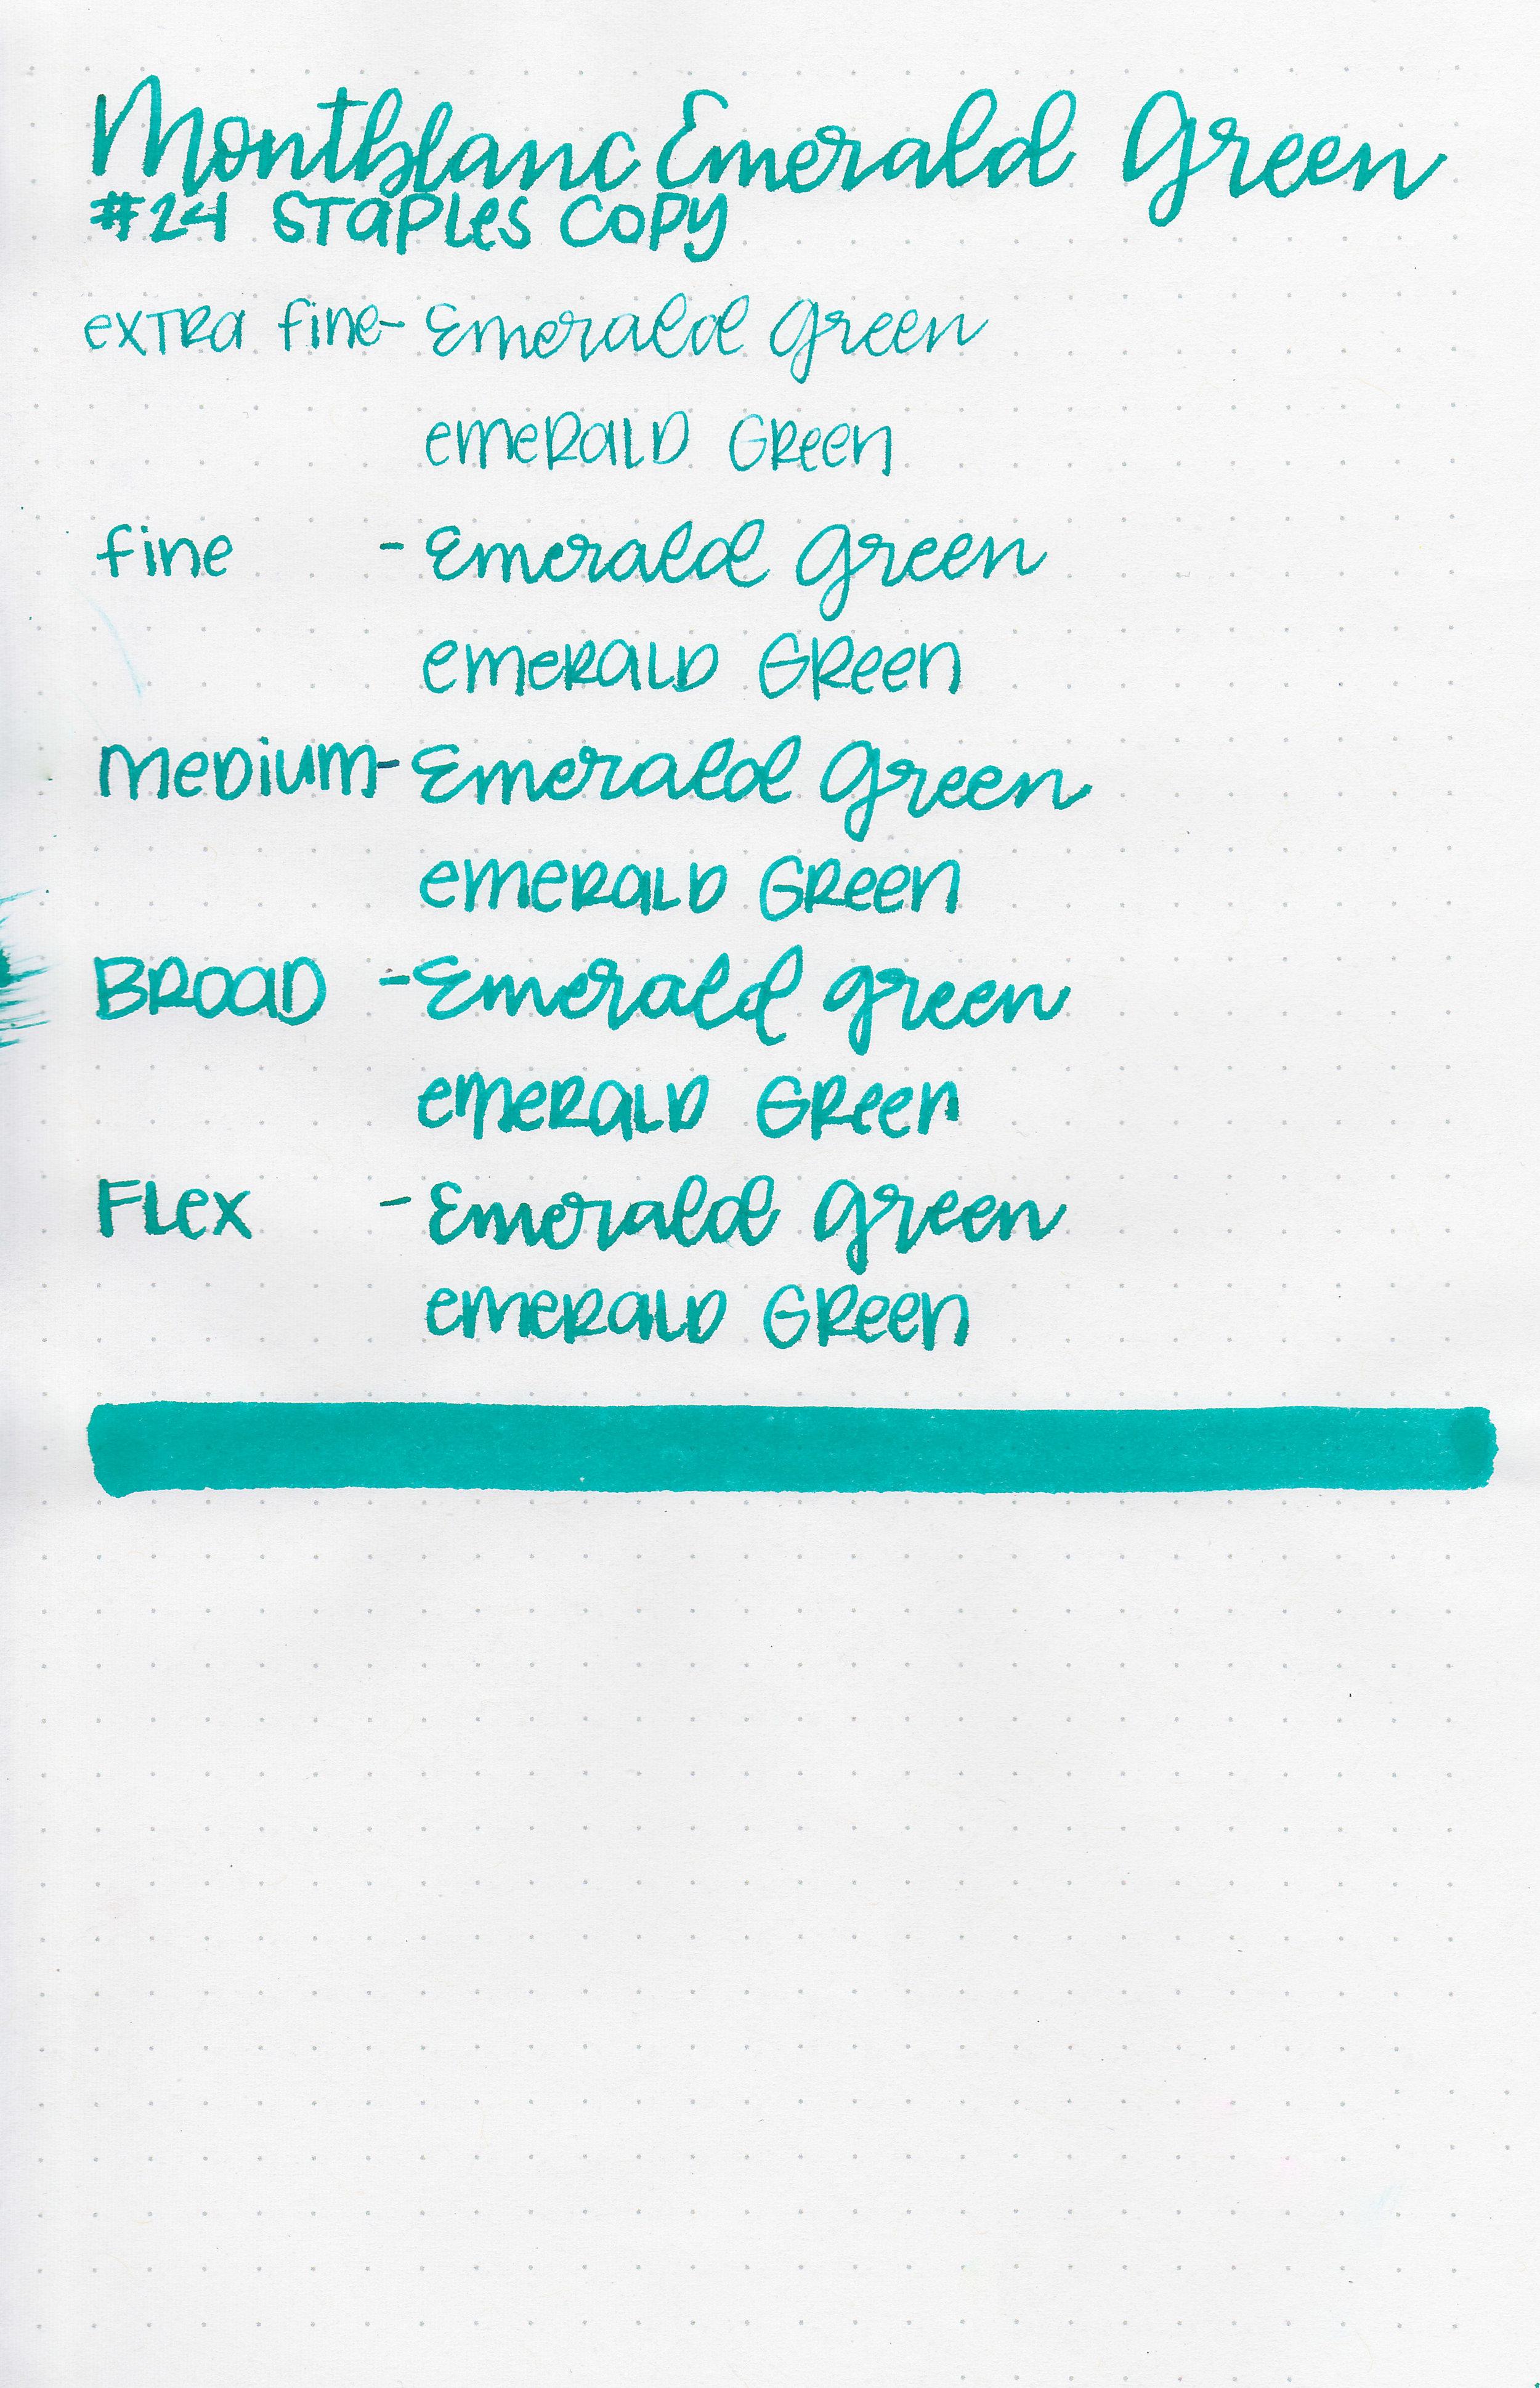 mb-emerald-green-16.jpg